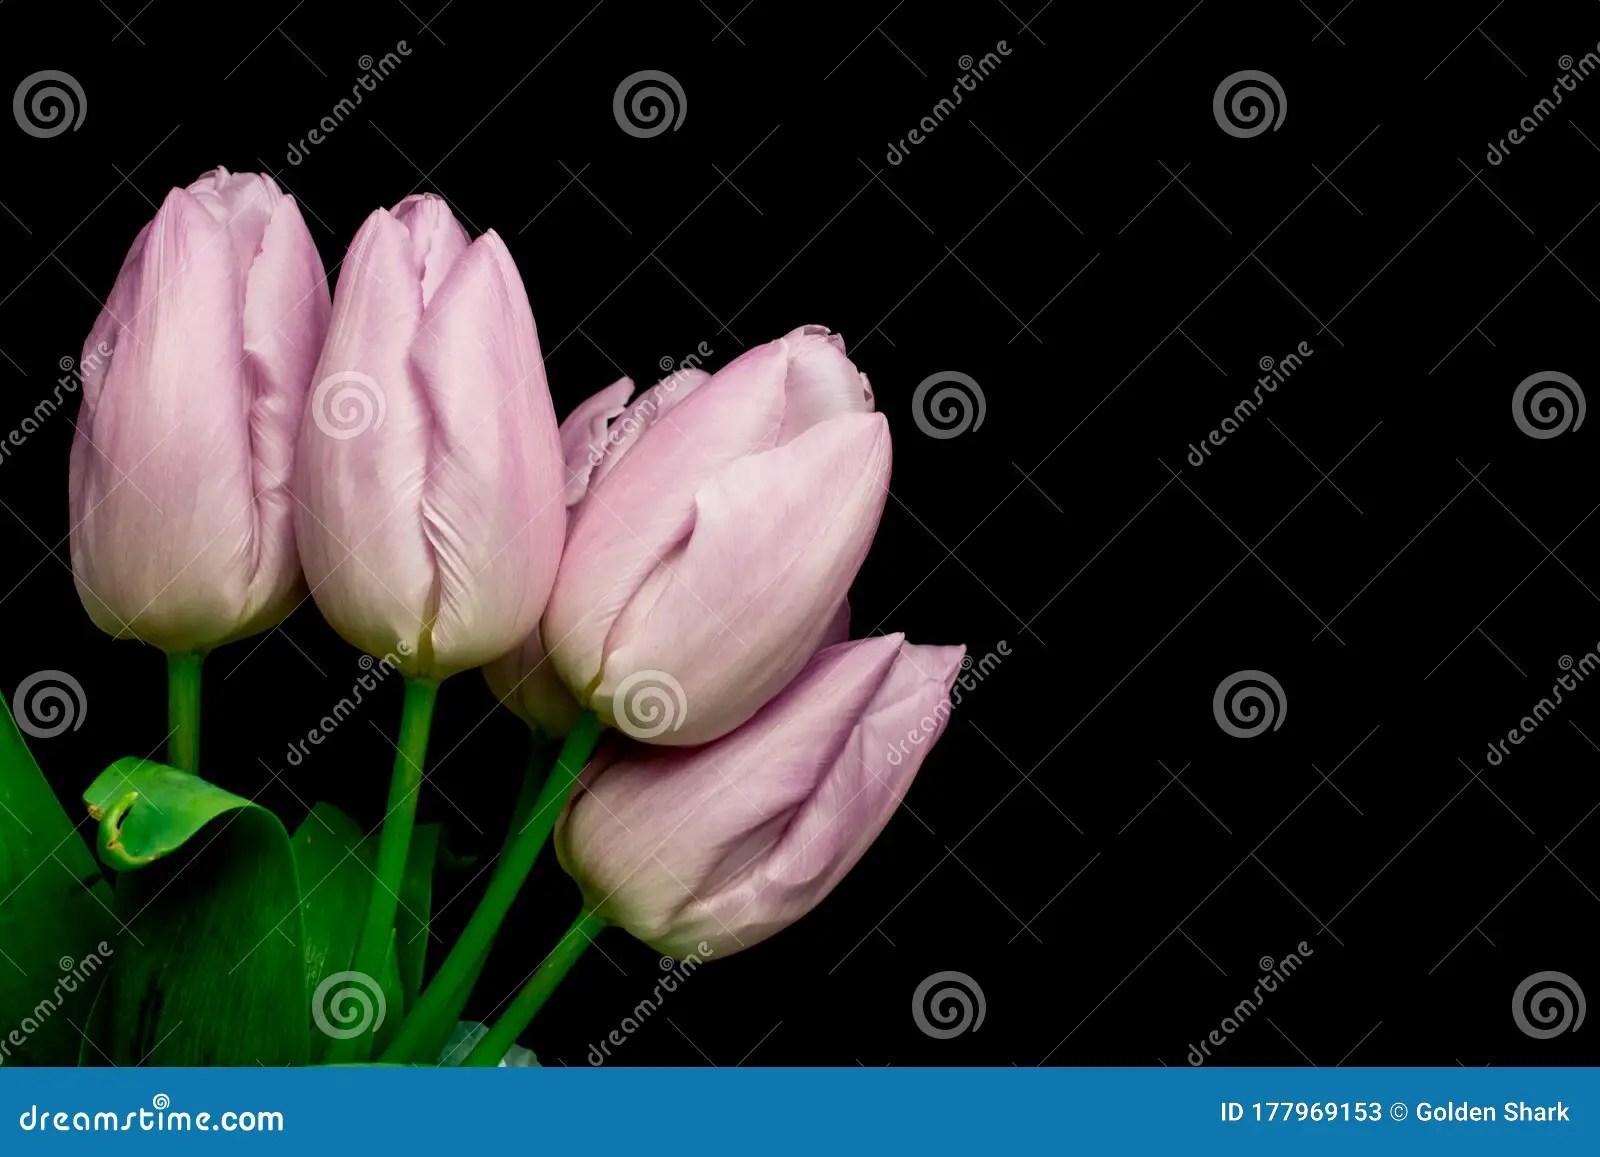 Tulips Flowers On Black Background Stock Image